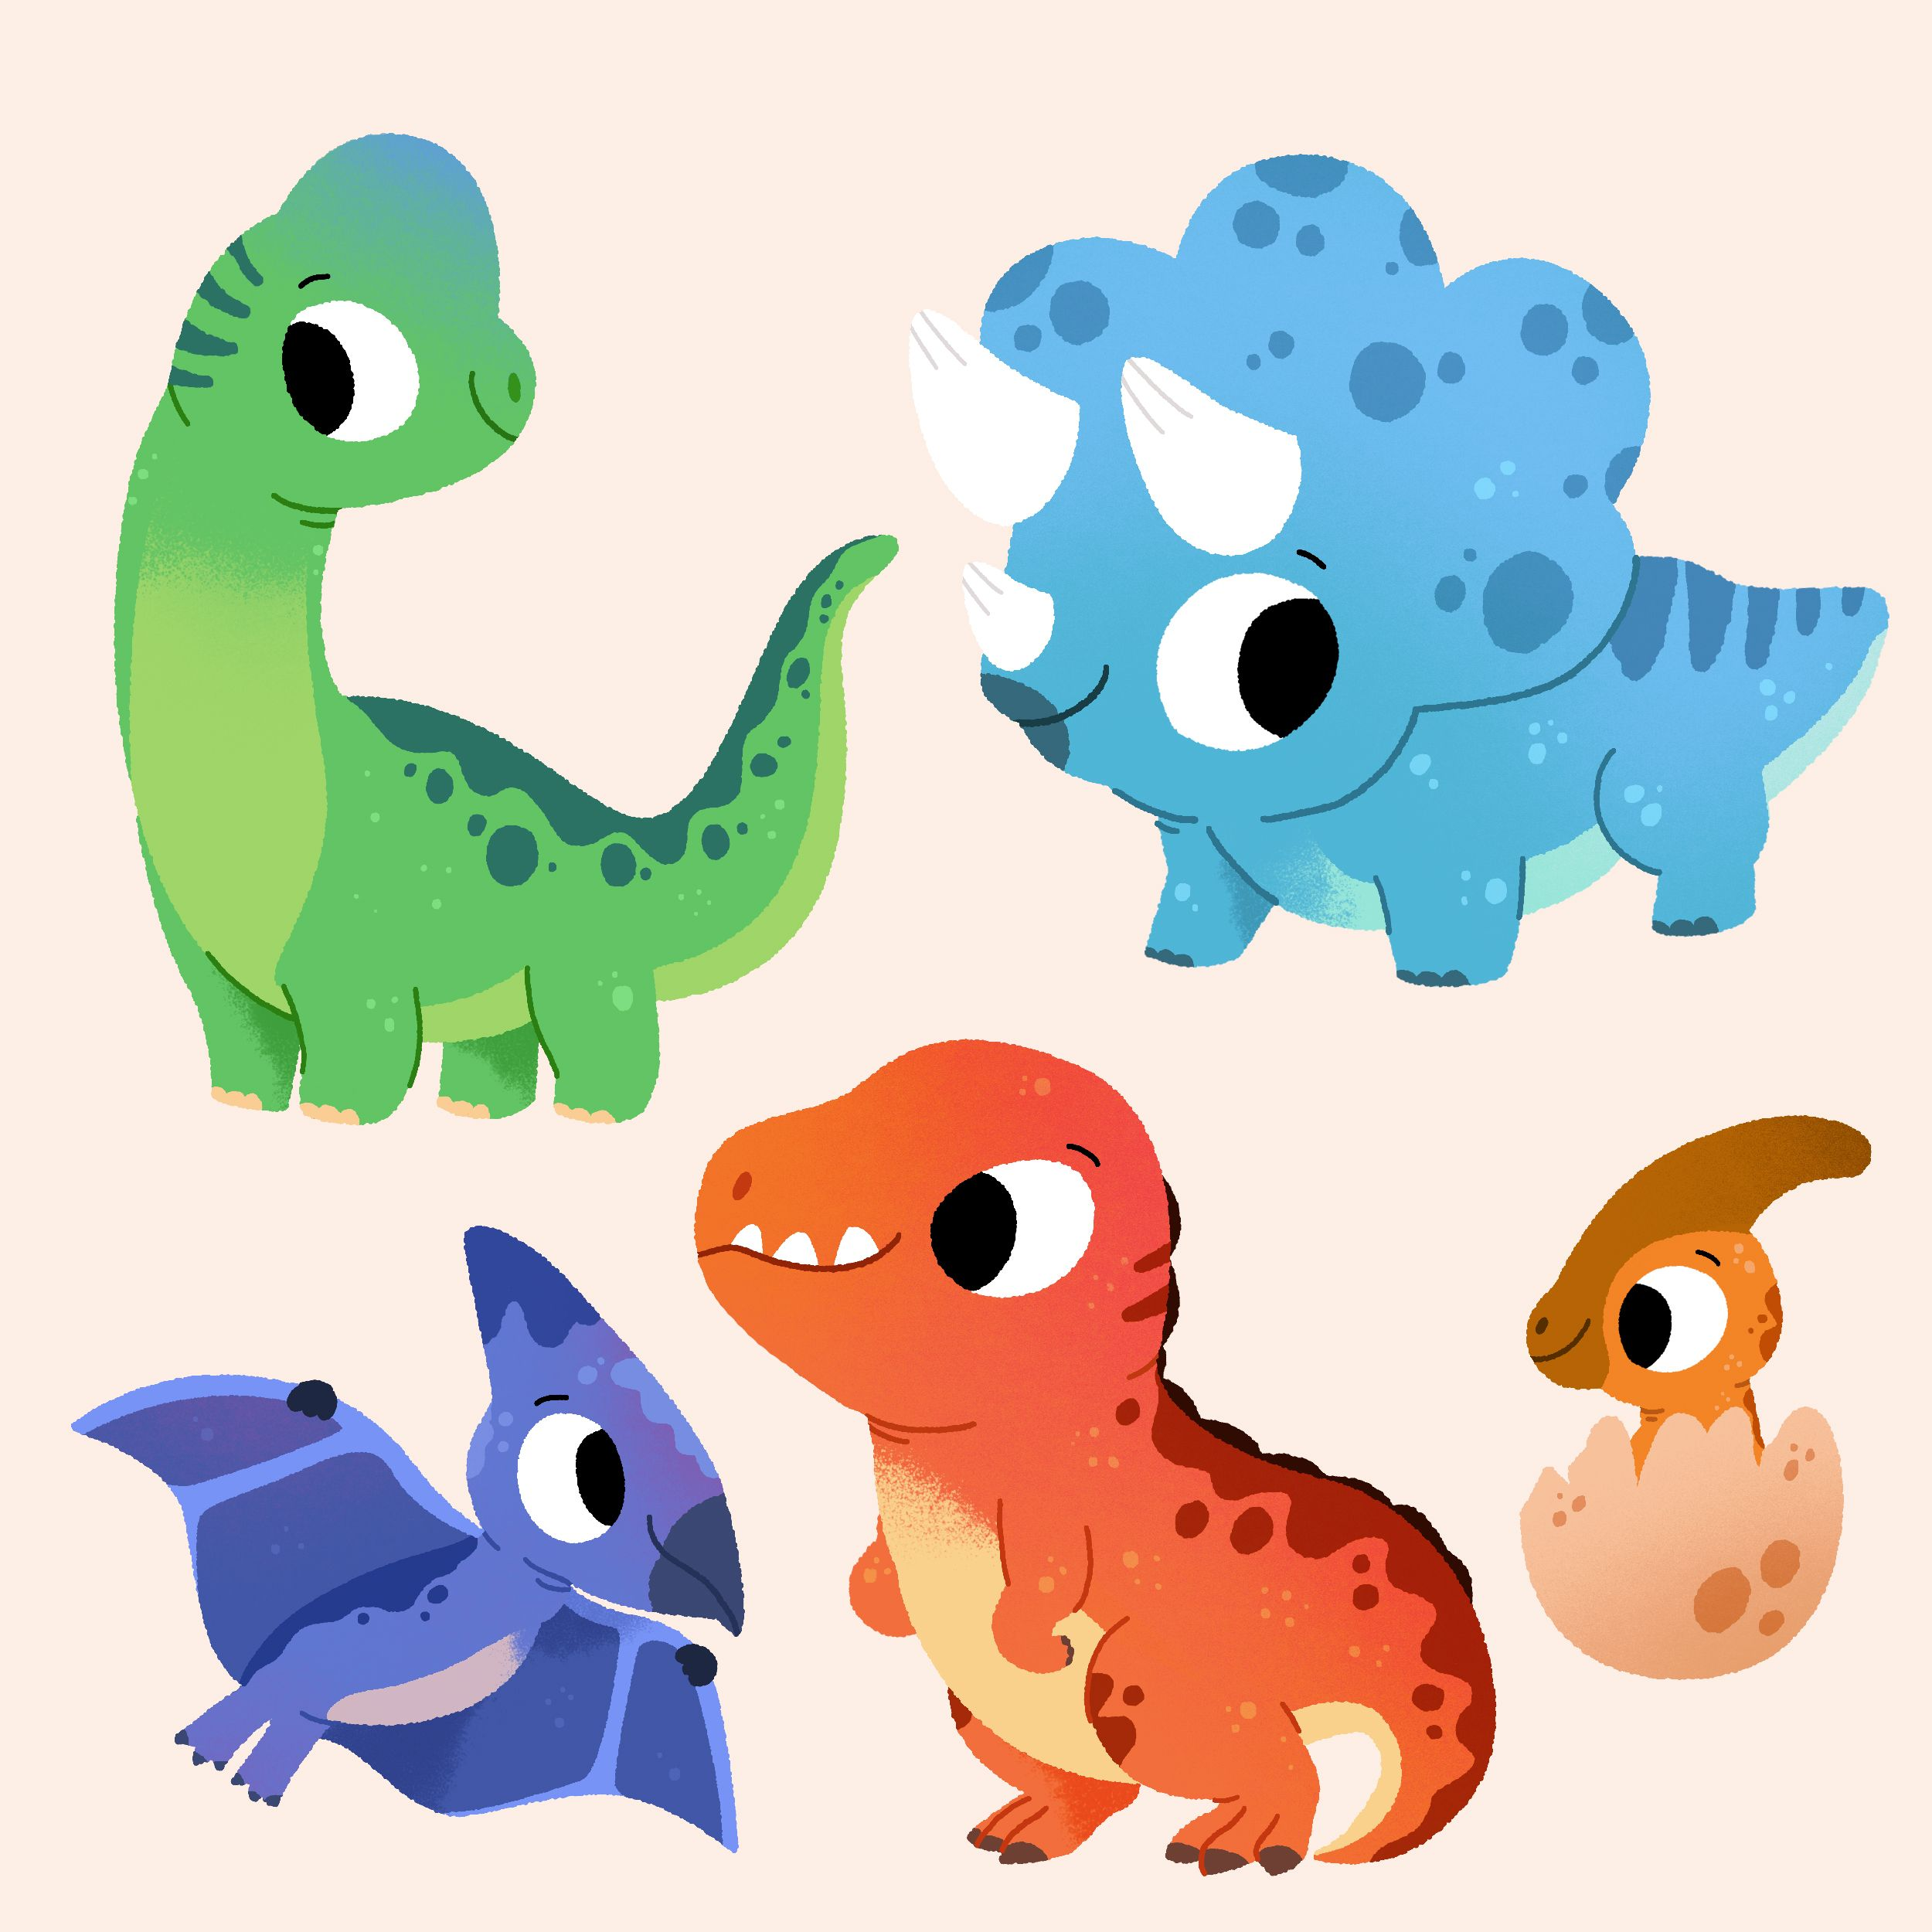 Carlo Beranek On Twitter Animal Illustration Kids Dinosaur Illustration Kids Graphic Design